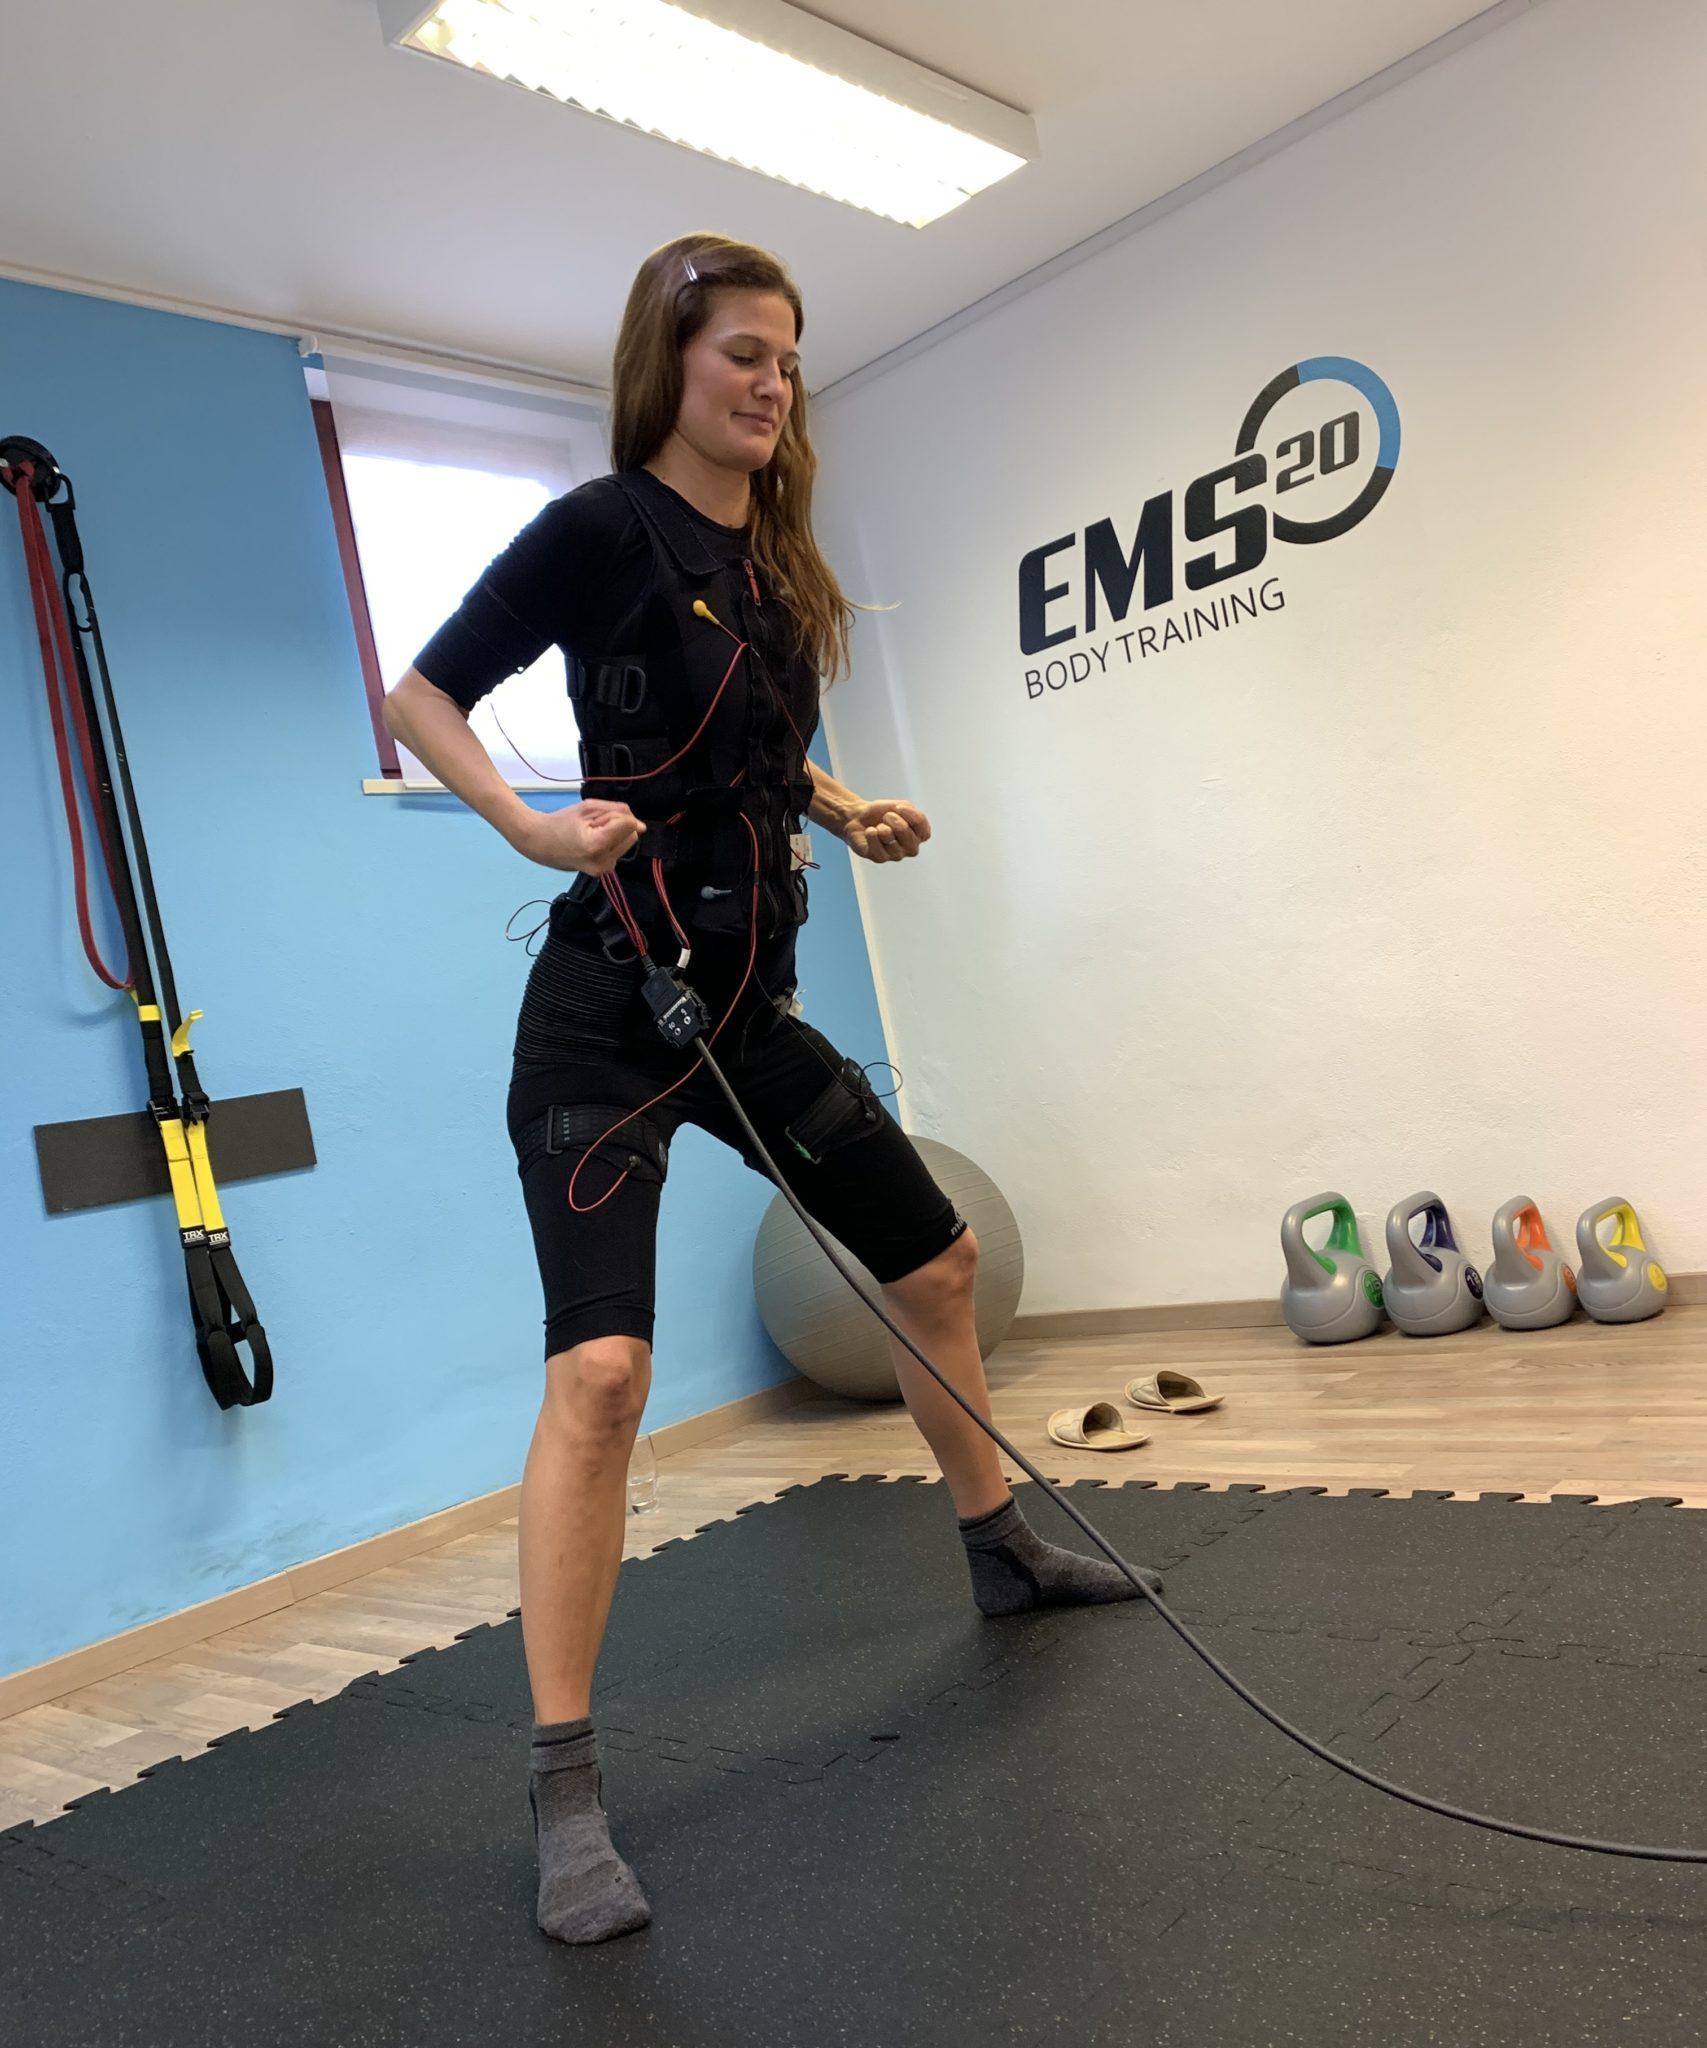 Doing a bodytech workout with EMS 20 Training, Slovenia, Ljubljana